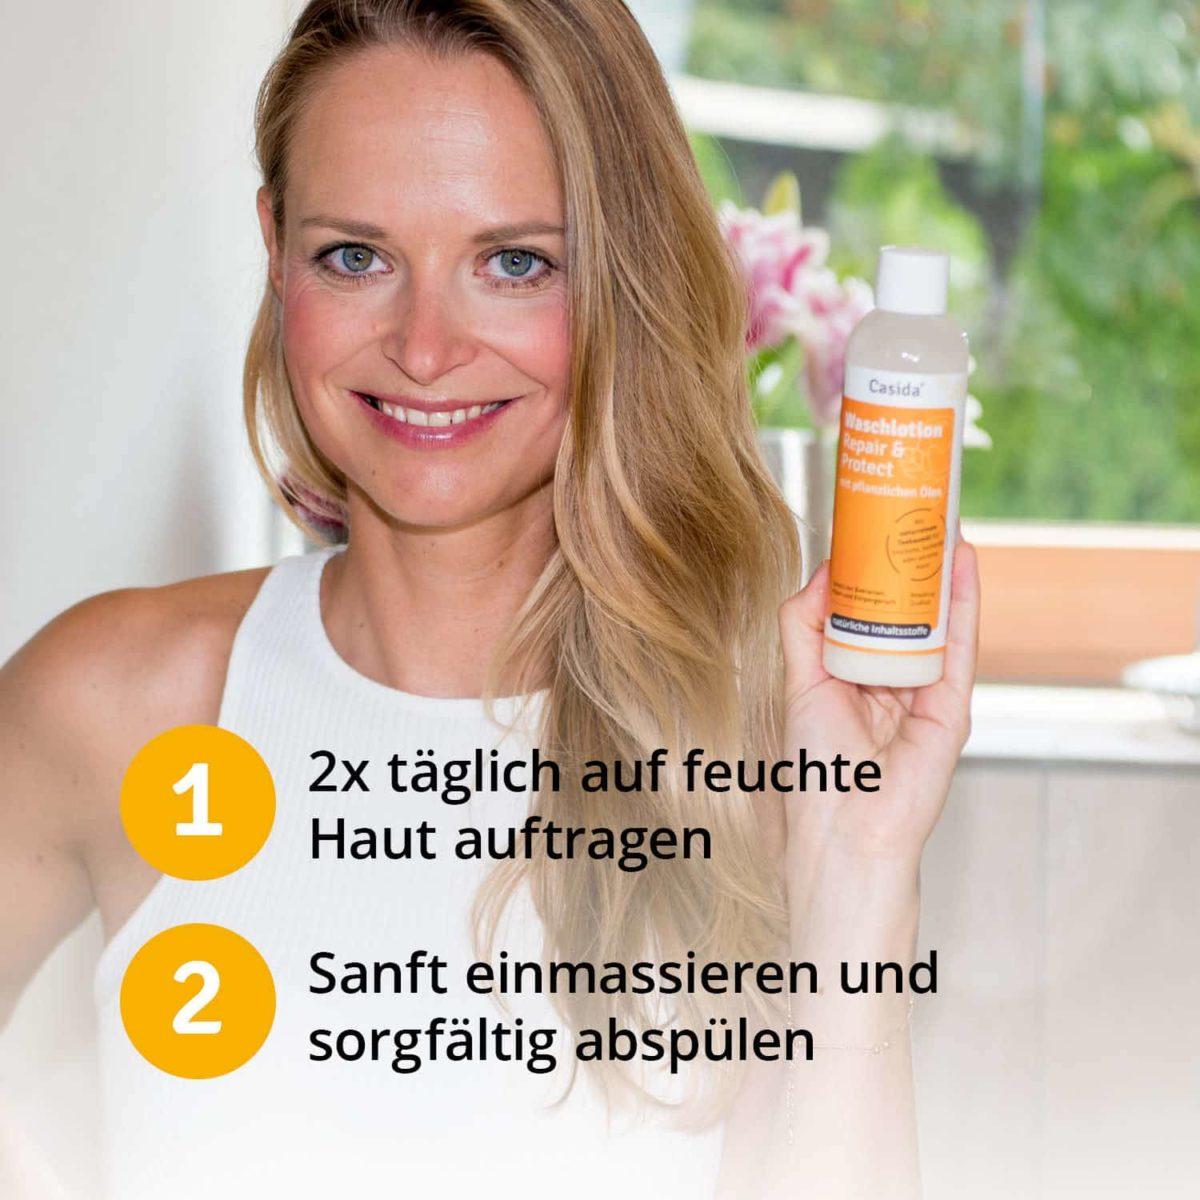 Casida Washing Lotion Repair & Protect 200 ml 13168379 PZN Apotheke Nagelpilz Fußpilz6